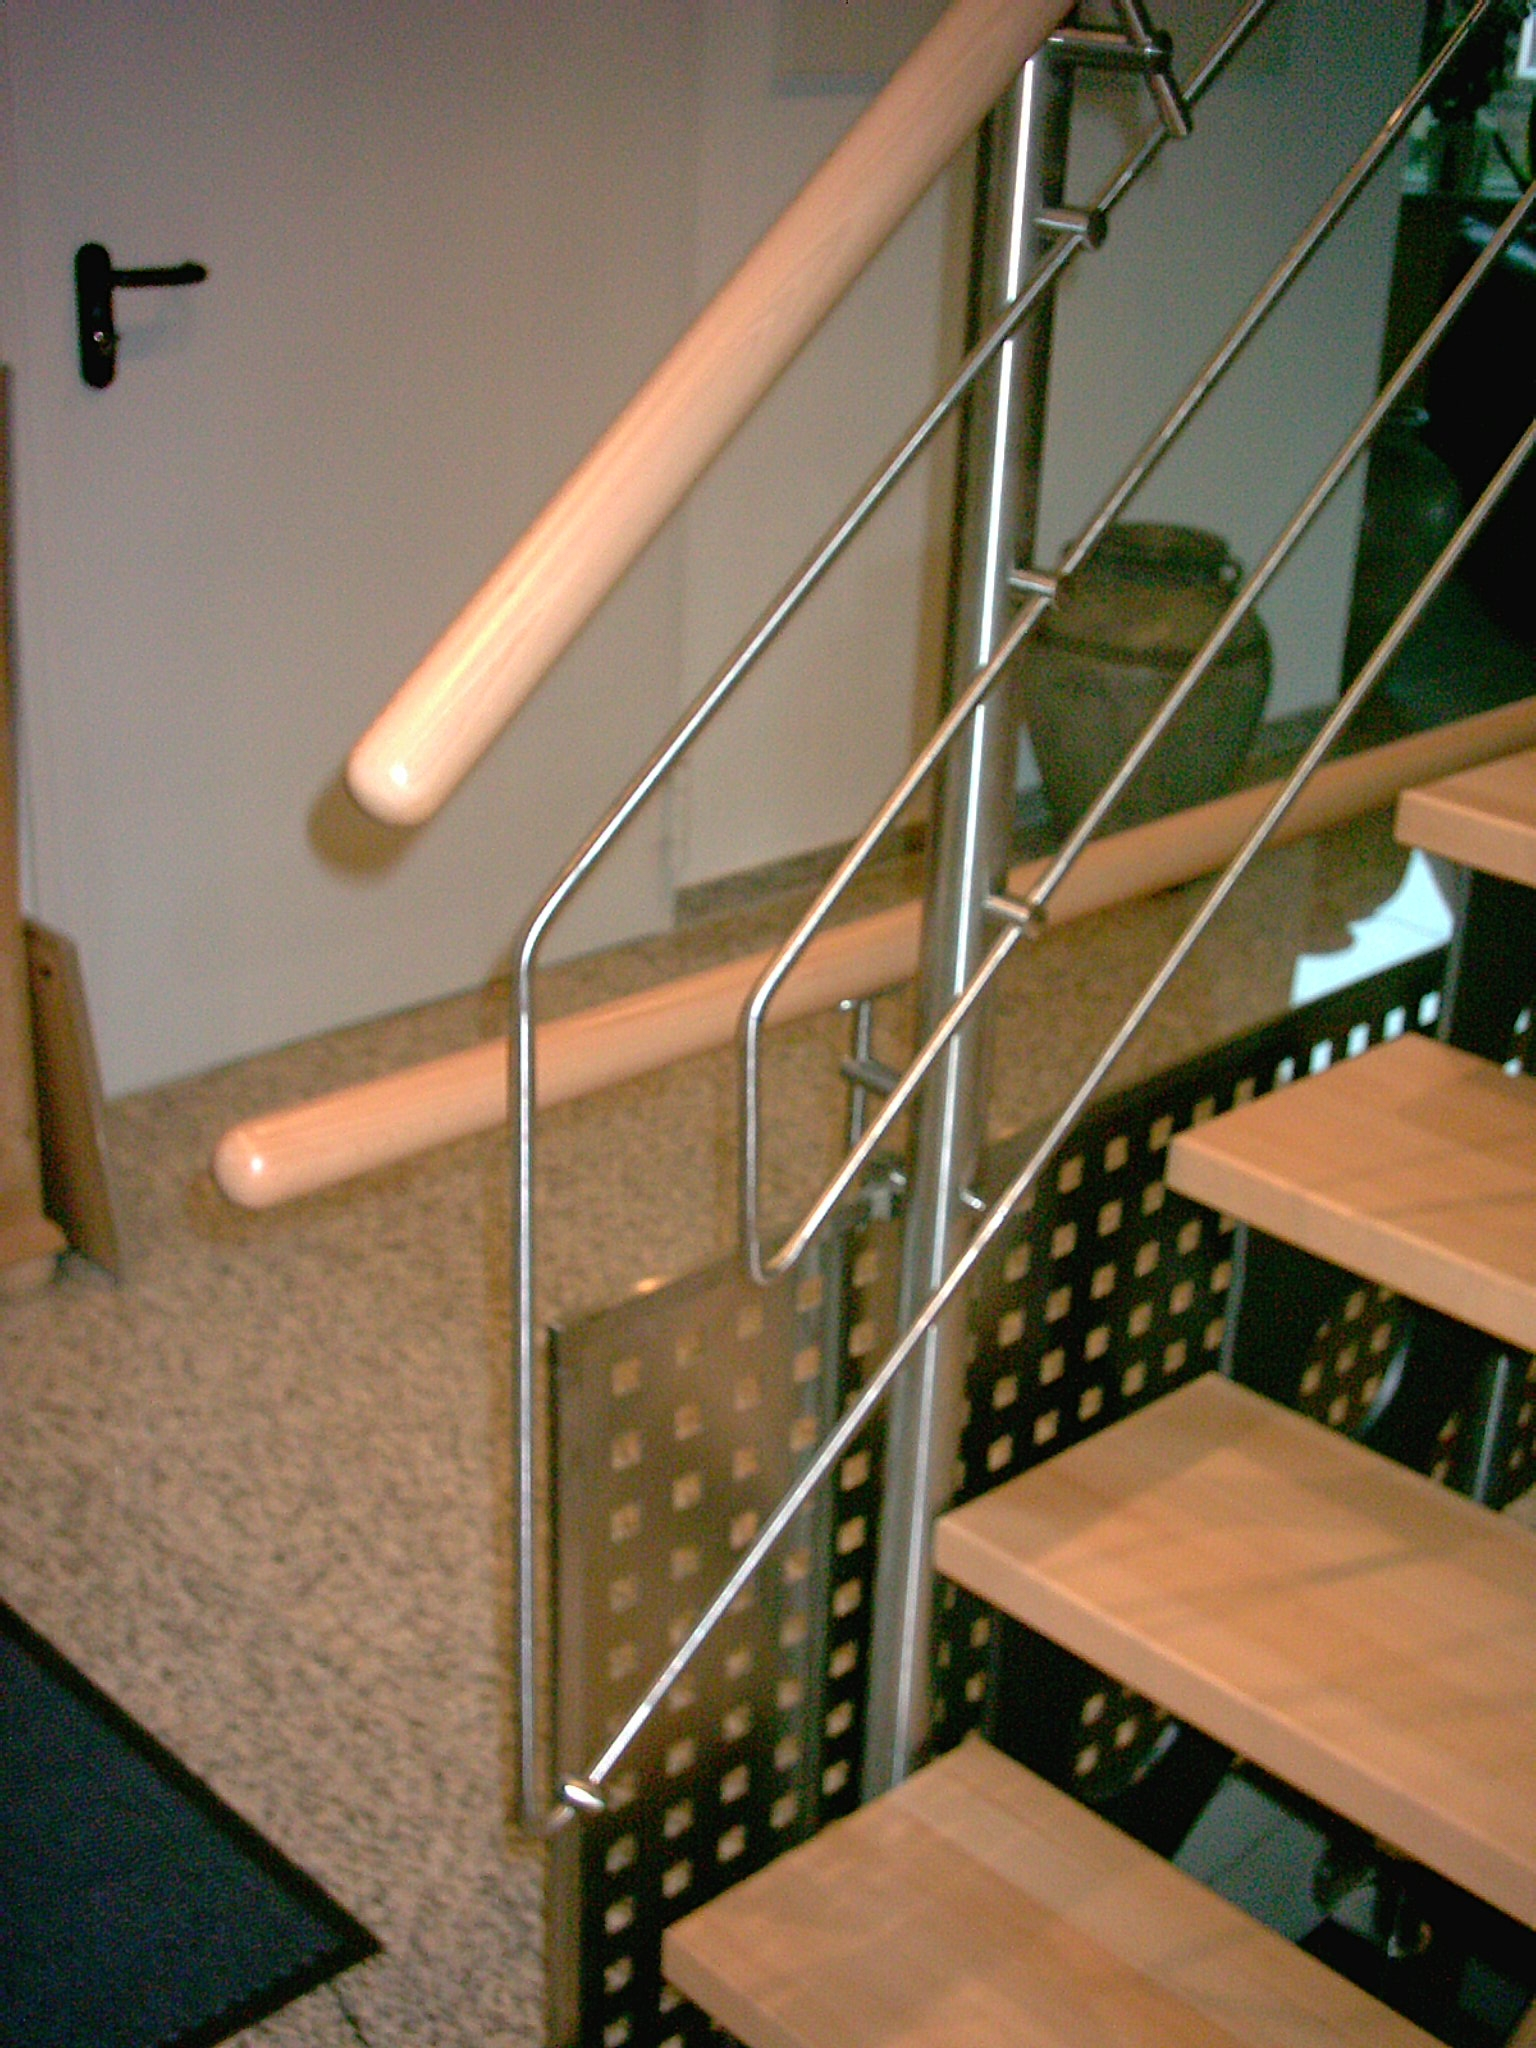 metallbau wuppertal gel nder innen treppengel nder aus edelstahl mit holzhandlauf. Black Bedroom Furniture Sets. Home Design Ideas